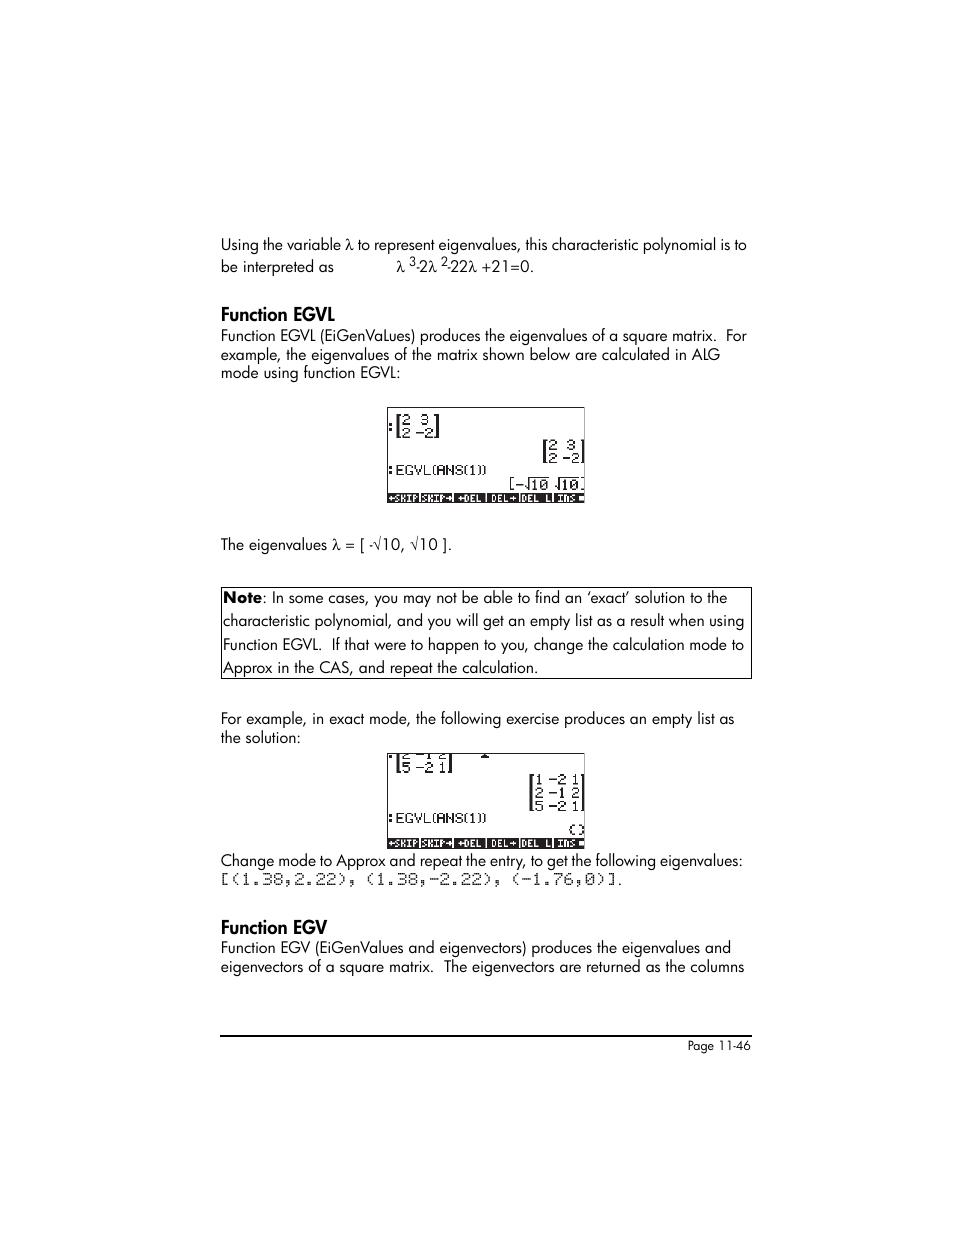 Hp 50g Manuals Pin Way Switch Diagram Multiple Lights Pdf 65kb On Pinterest Array Function Egvl Egv 11 46 Rh Manualsdir Com